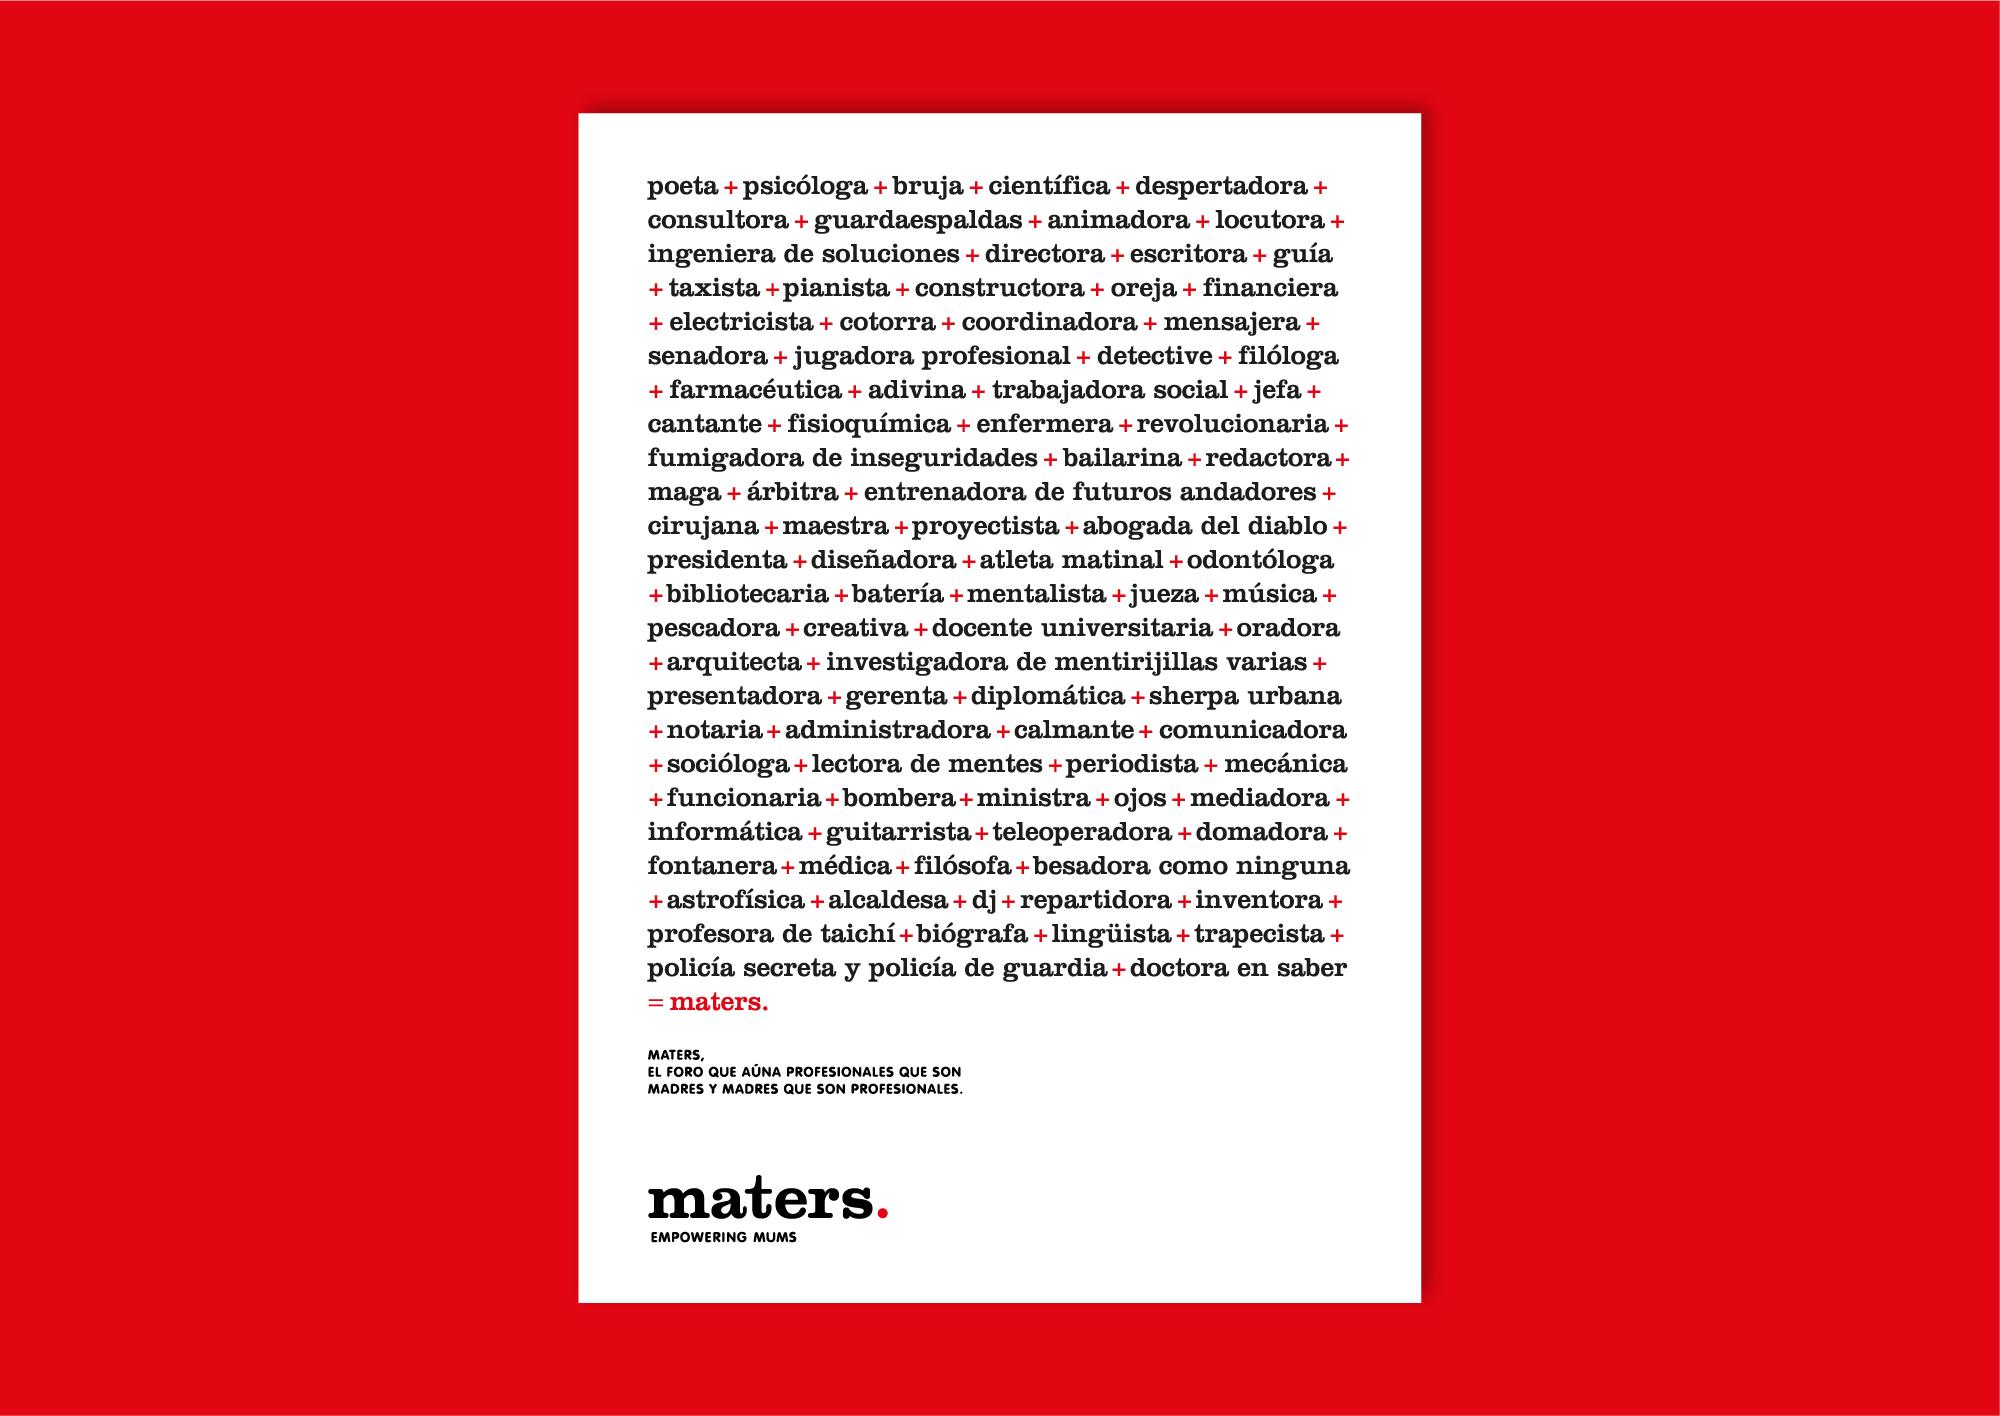 MATERS-GraficasFestival-05.jpg